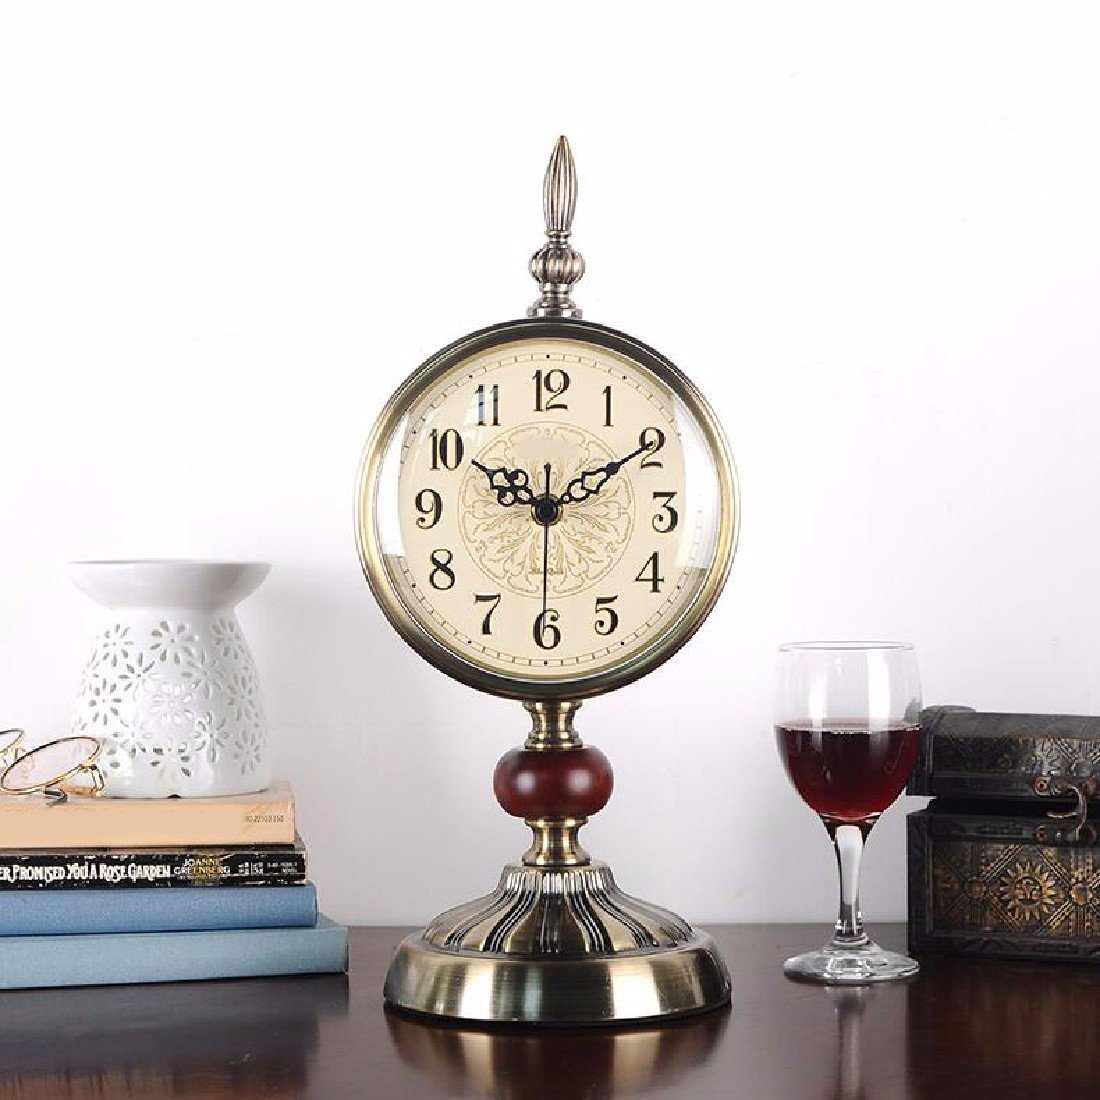 WAWZJ ウォールクロック美しい時計の席時計の復古の客間のヨーロッパ式の静音の寝室は鐘の金属のデスクトップの置物を並べます B07CVJXWKV